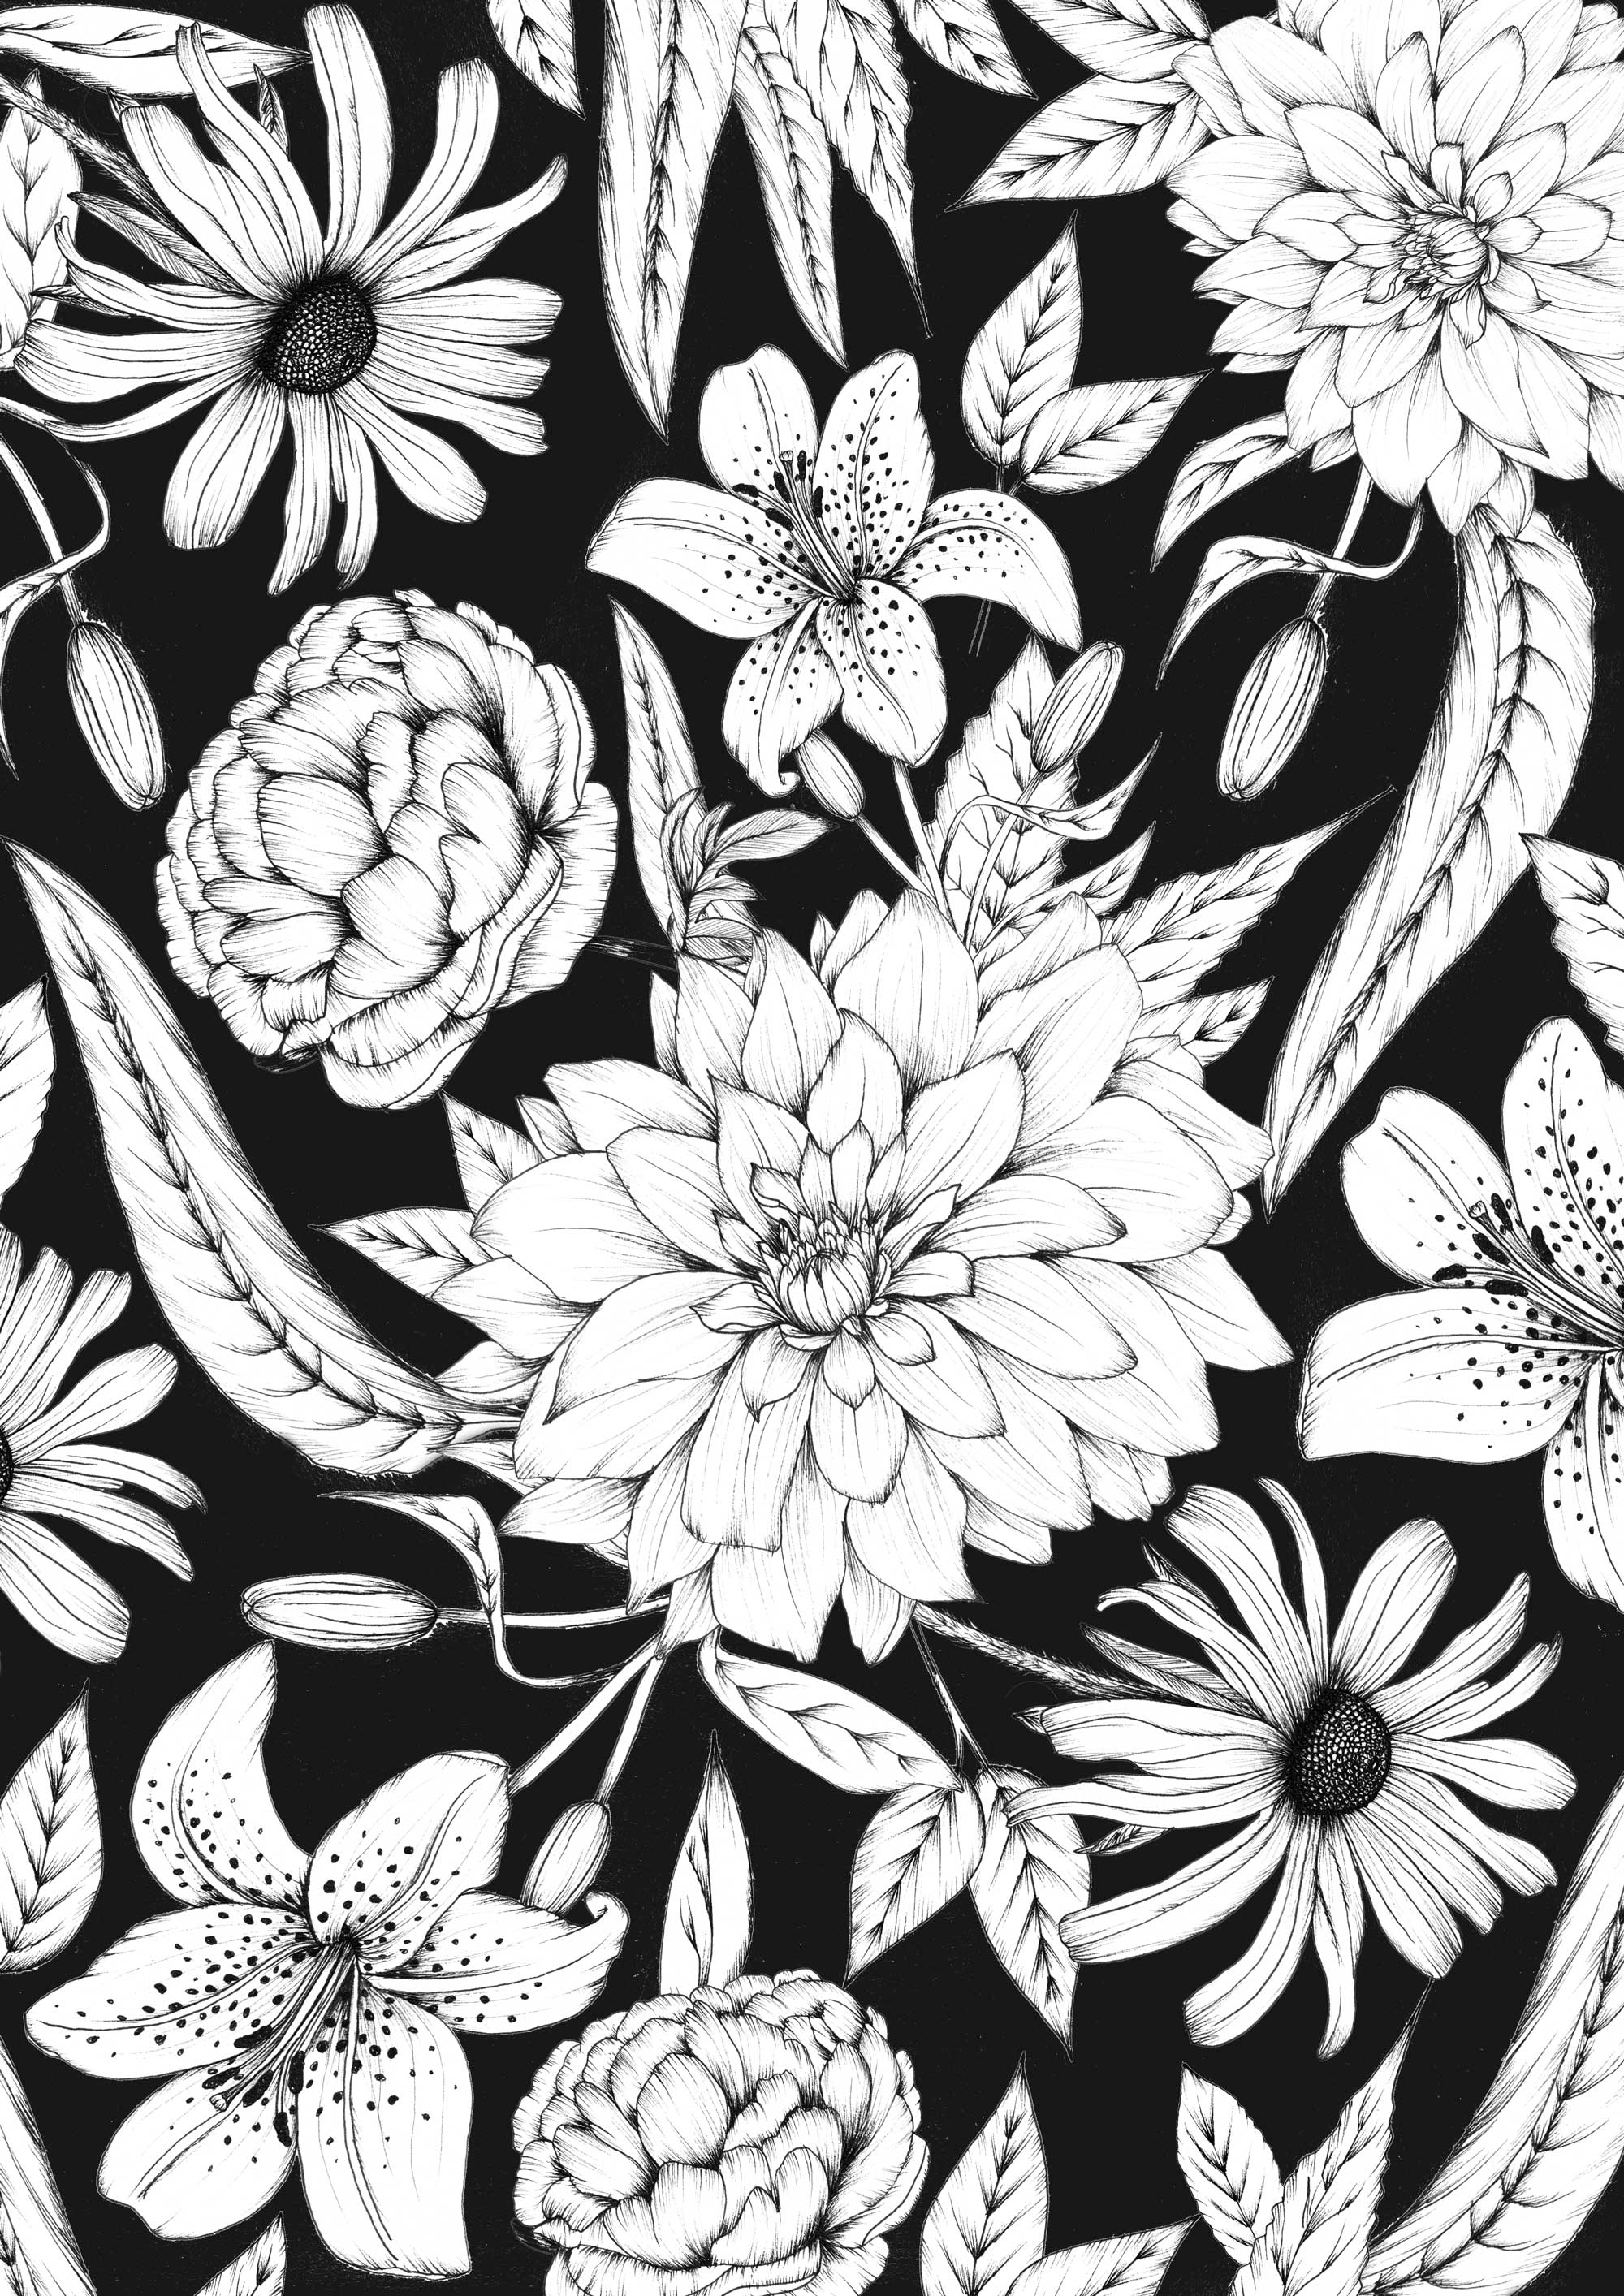 Skillshare-FelicityandInk-How-To-Draw-Ink-Florals.jpg